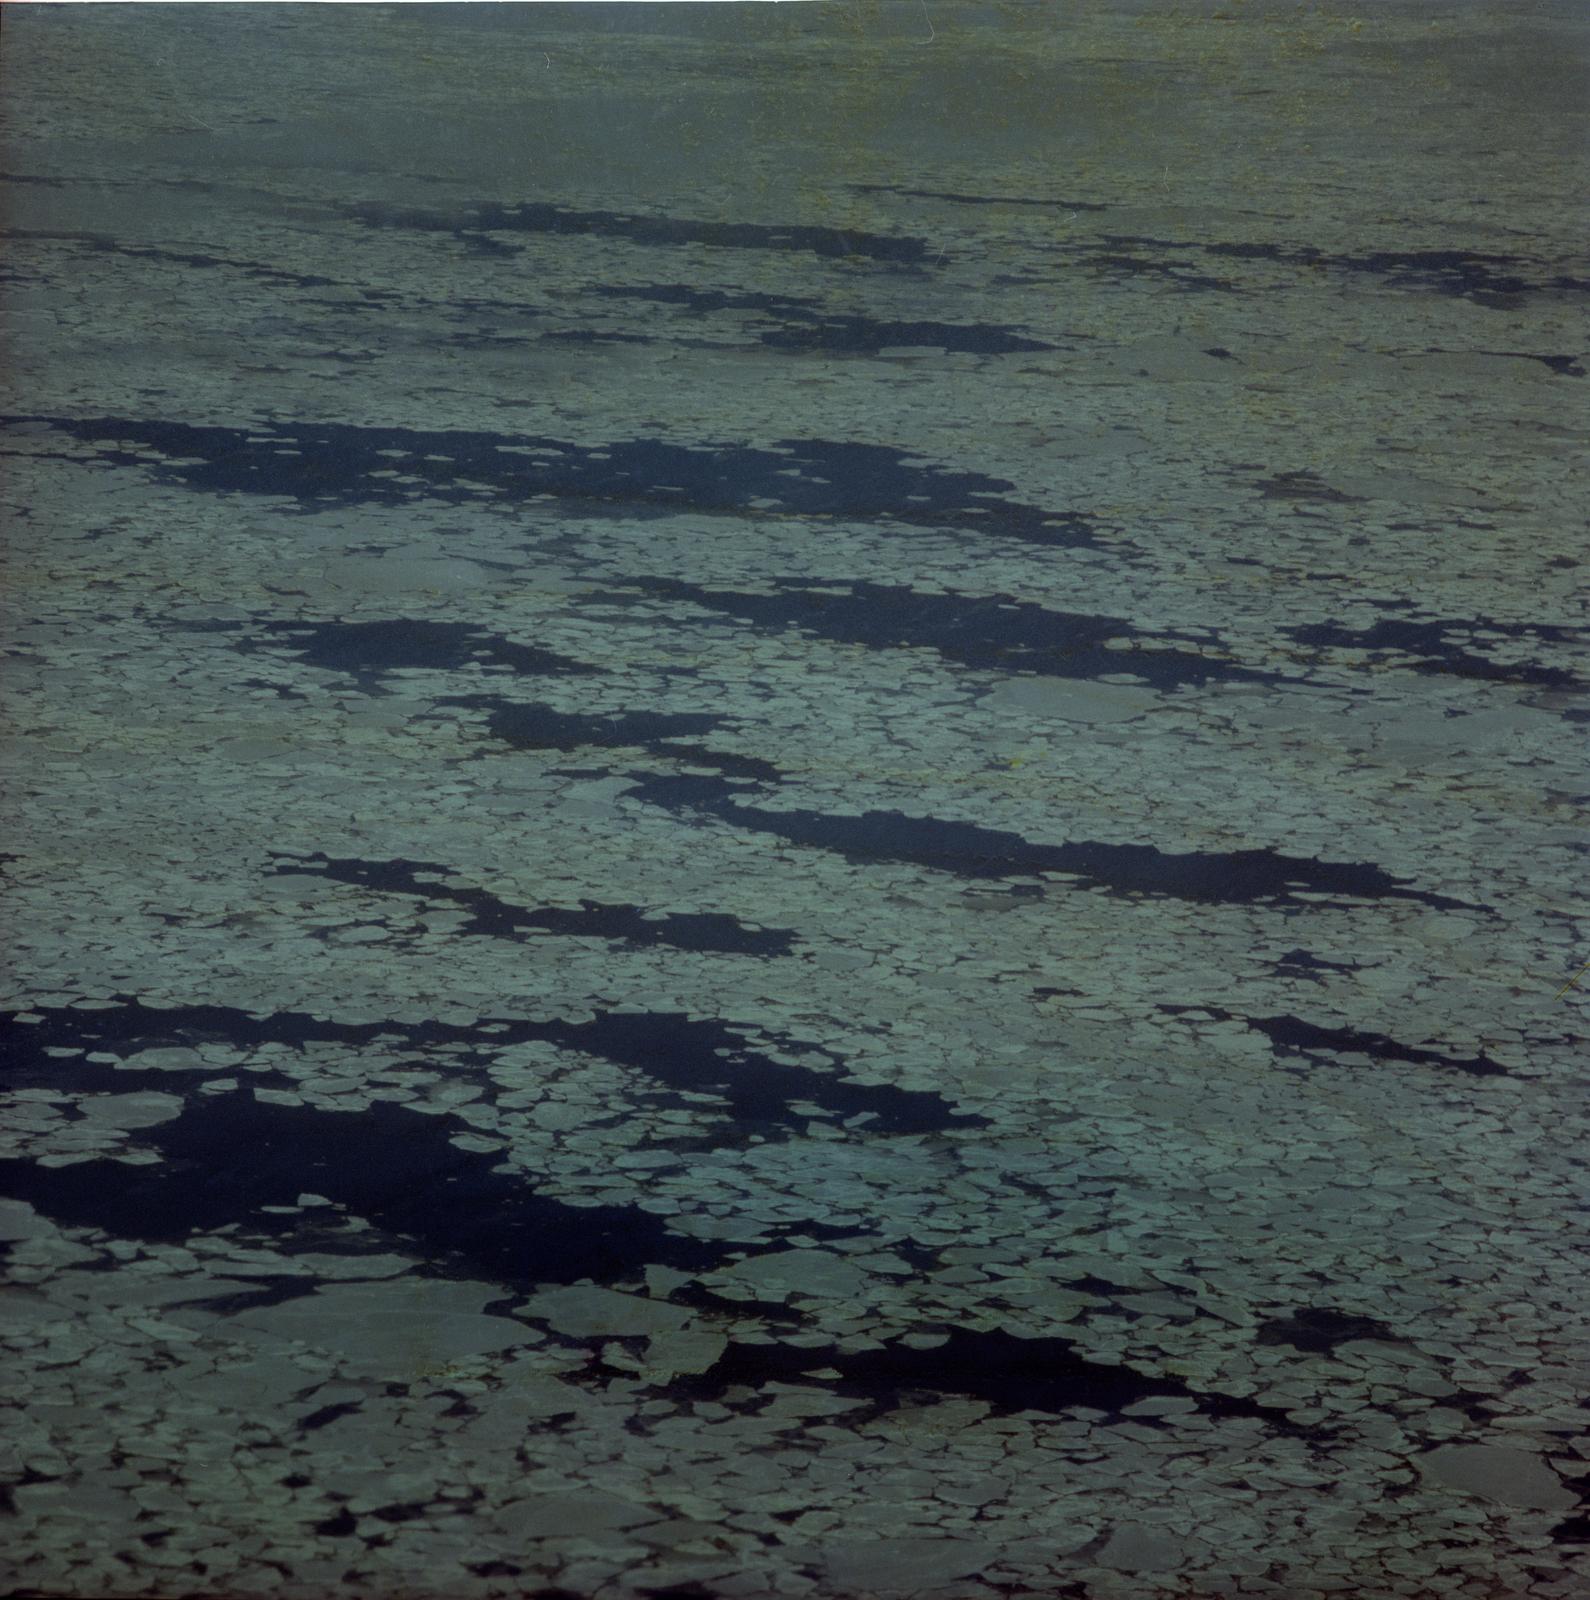 1979 SEA ICE RADAR EXPERIMENT